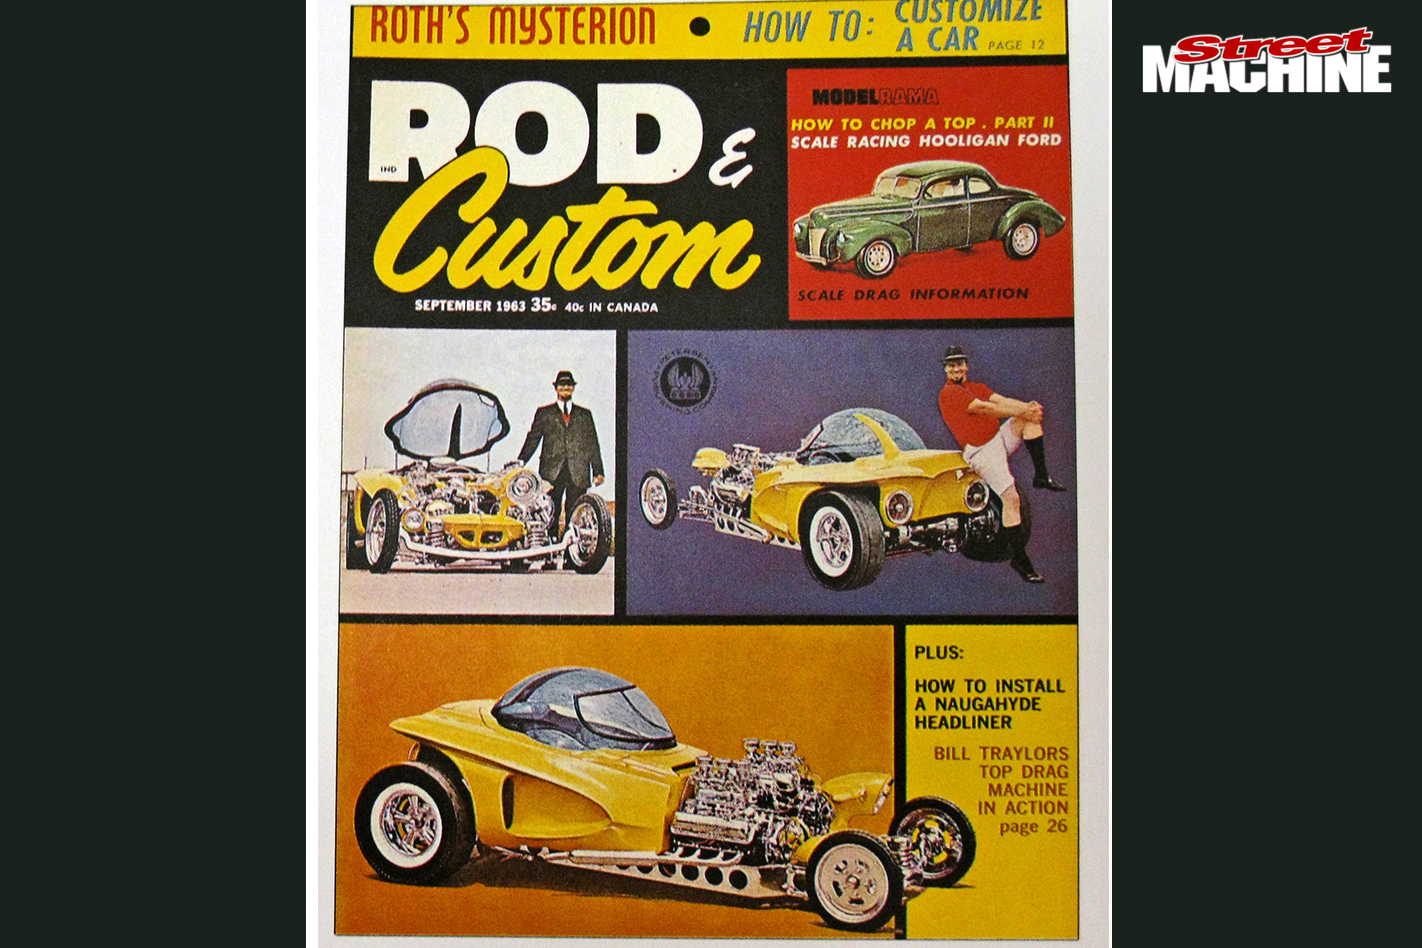 Fancy Rod Custom Magazine Pictures - Classic Cars Ideas - boiq.info